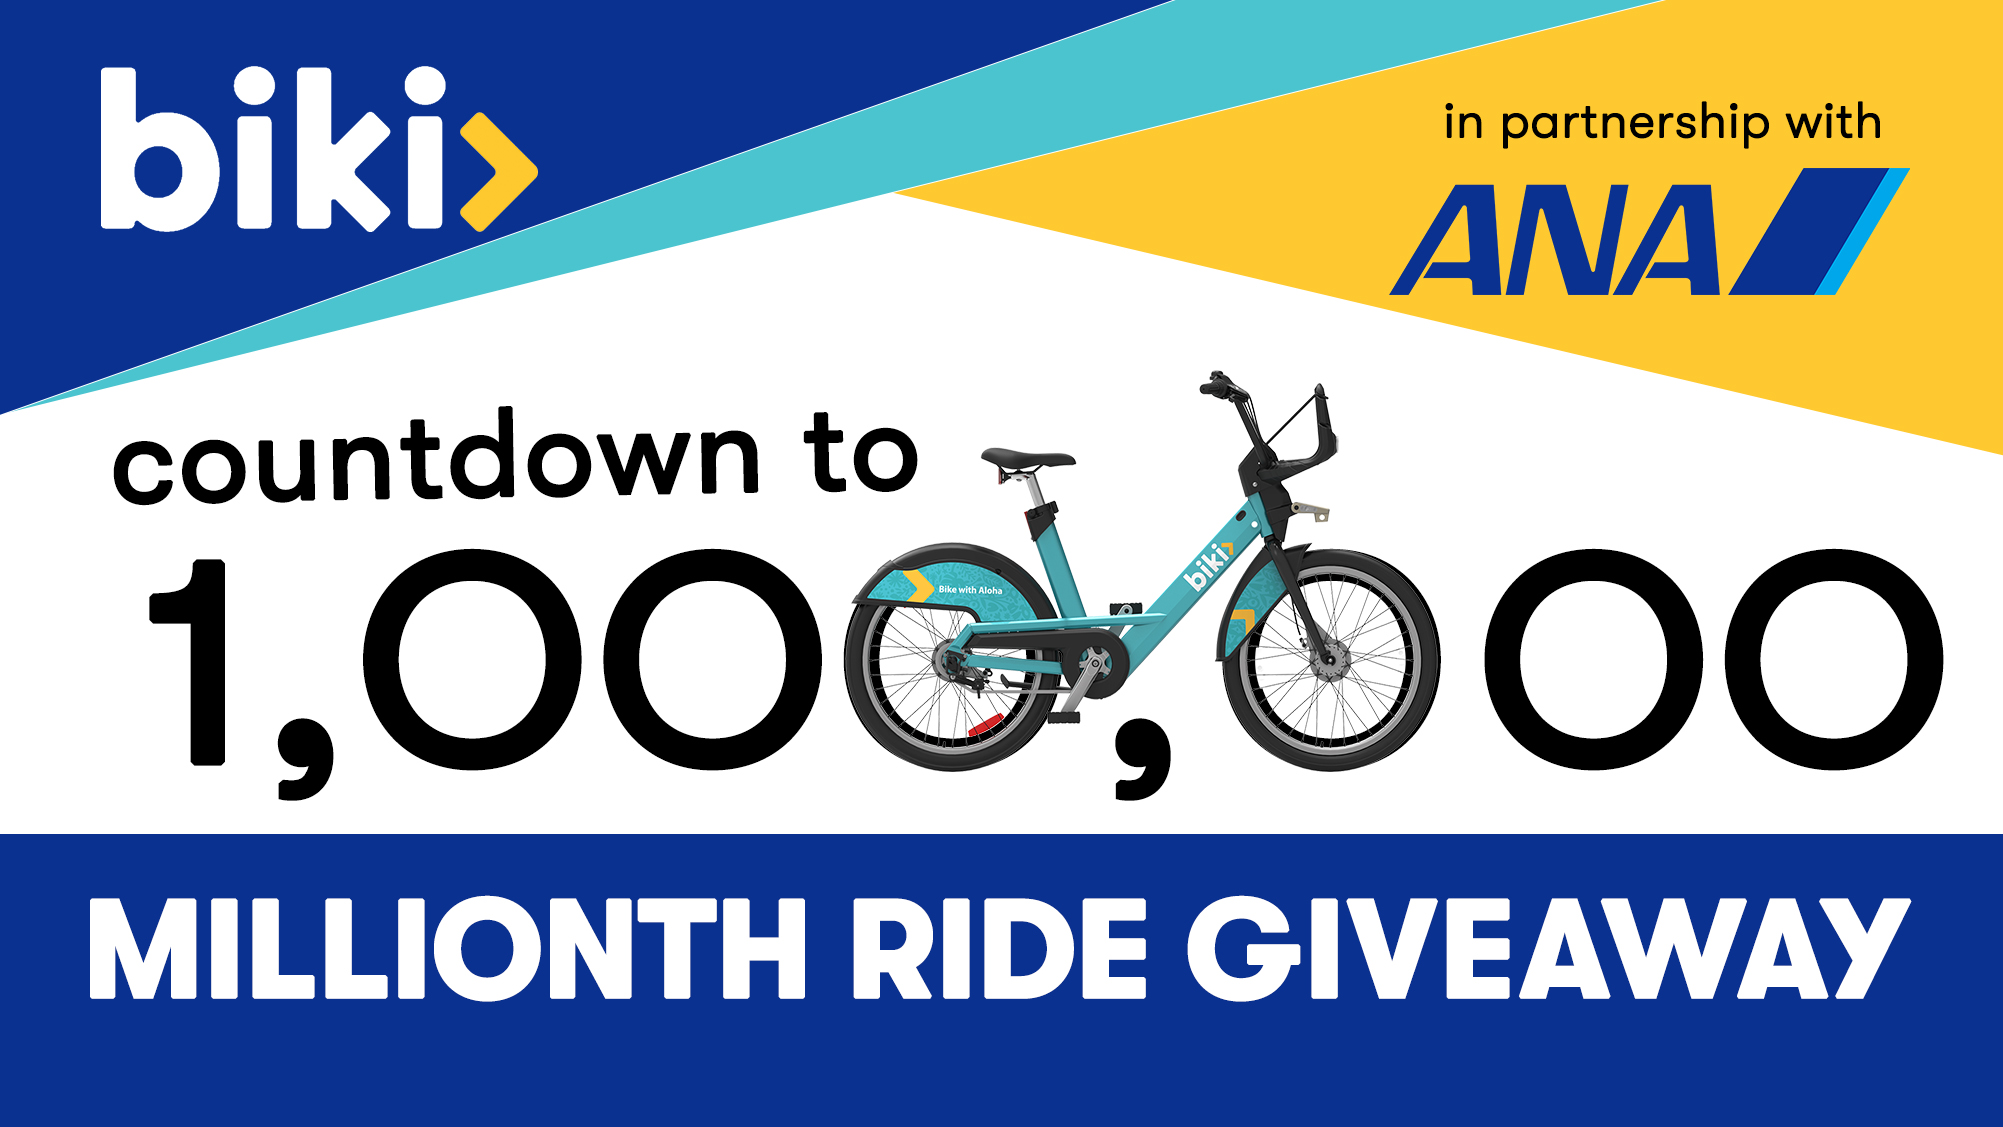 fe84bf31e3 One Million Rides Giveaway! - Biki